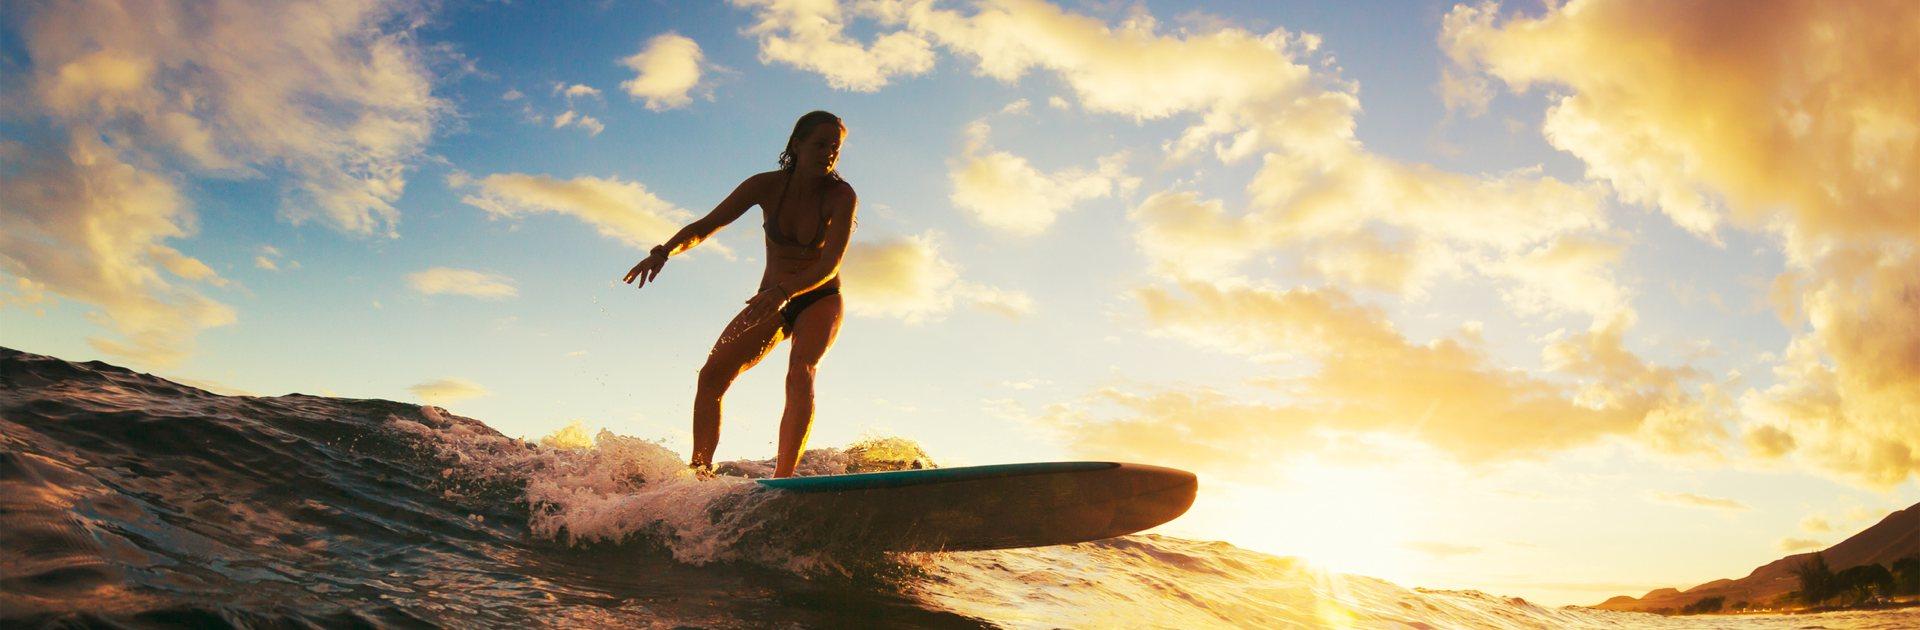 surfboard | verleih | conil | el palmar | cadiz | surfcamp spain